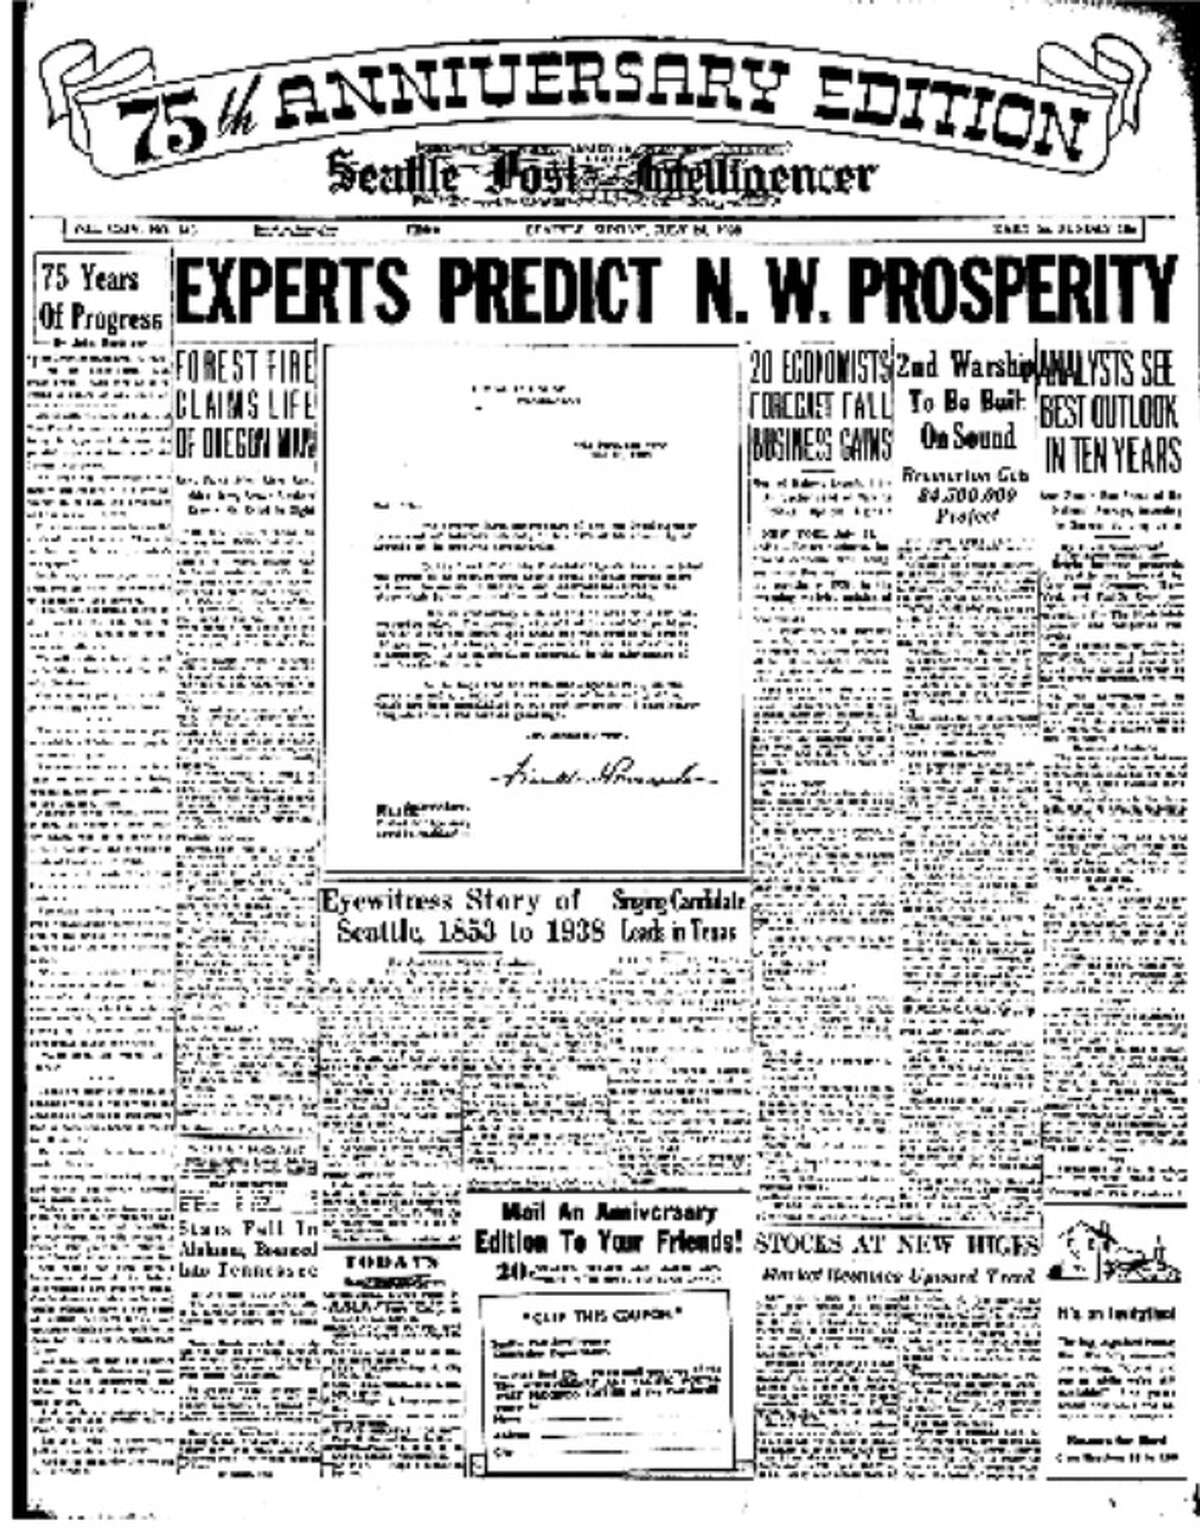 Seattle Post-Intelligencer, July 24th, 1938